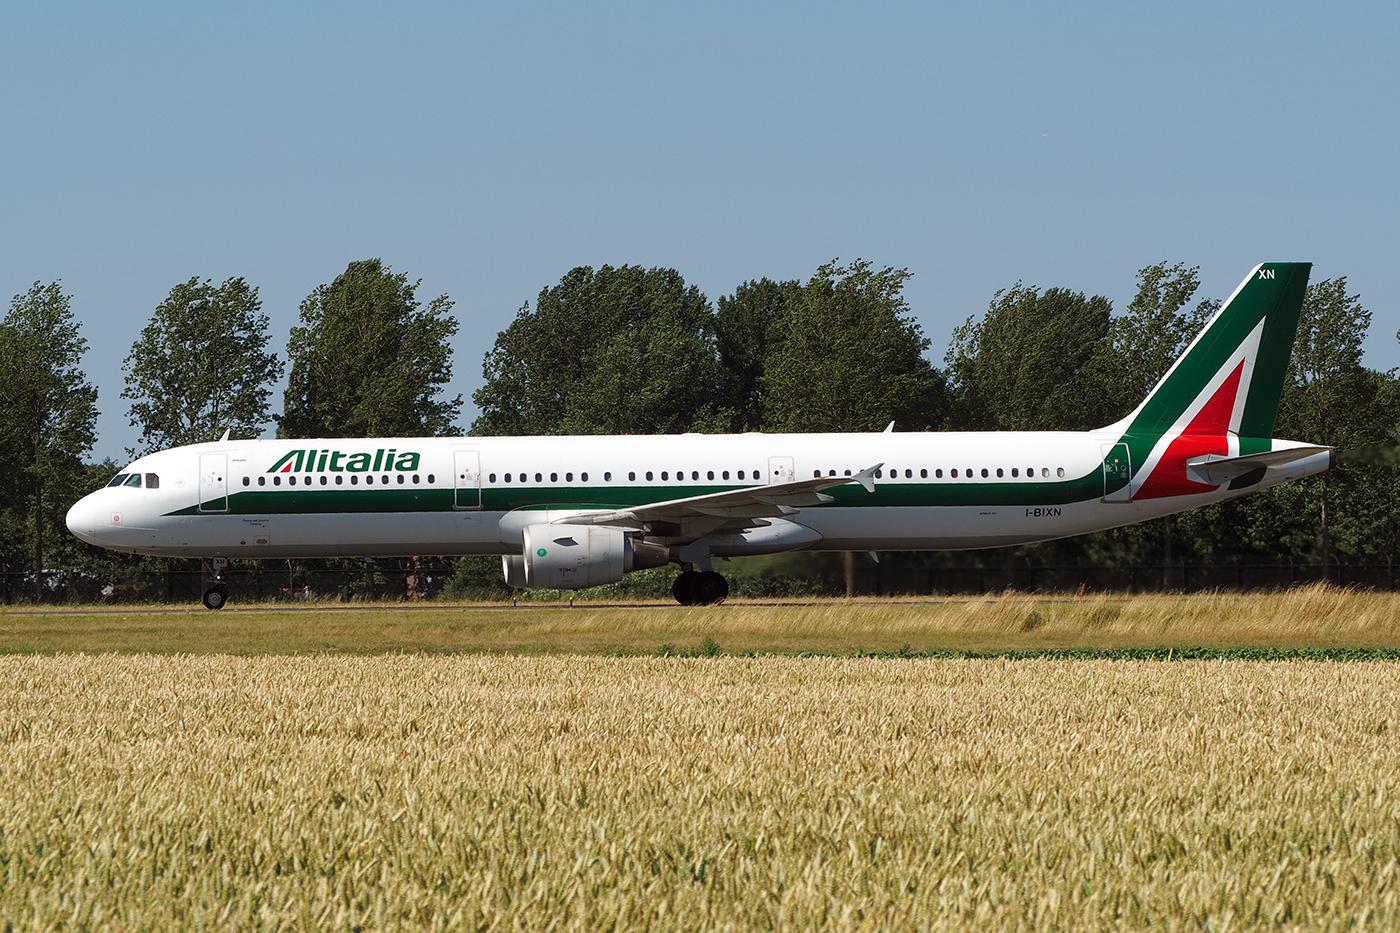 I-BIXN, Alitalia, A321